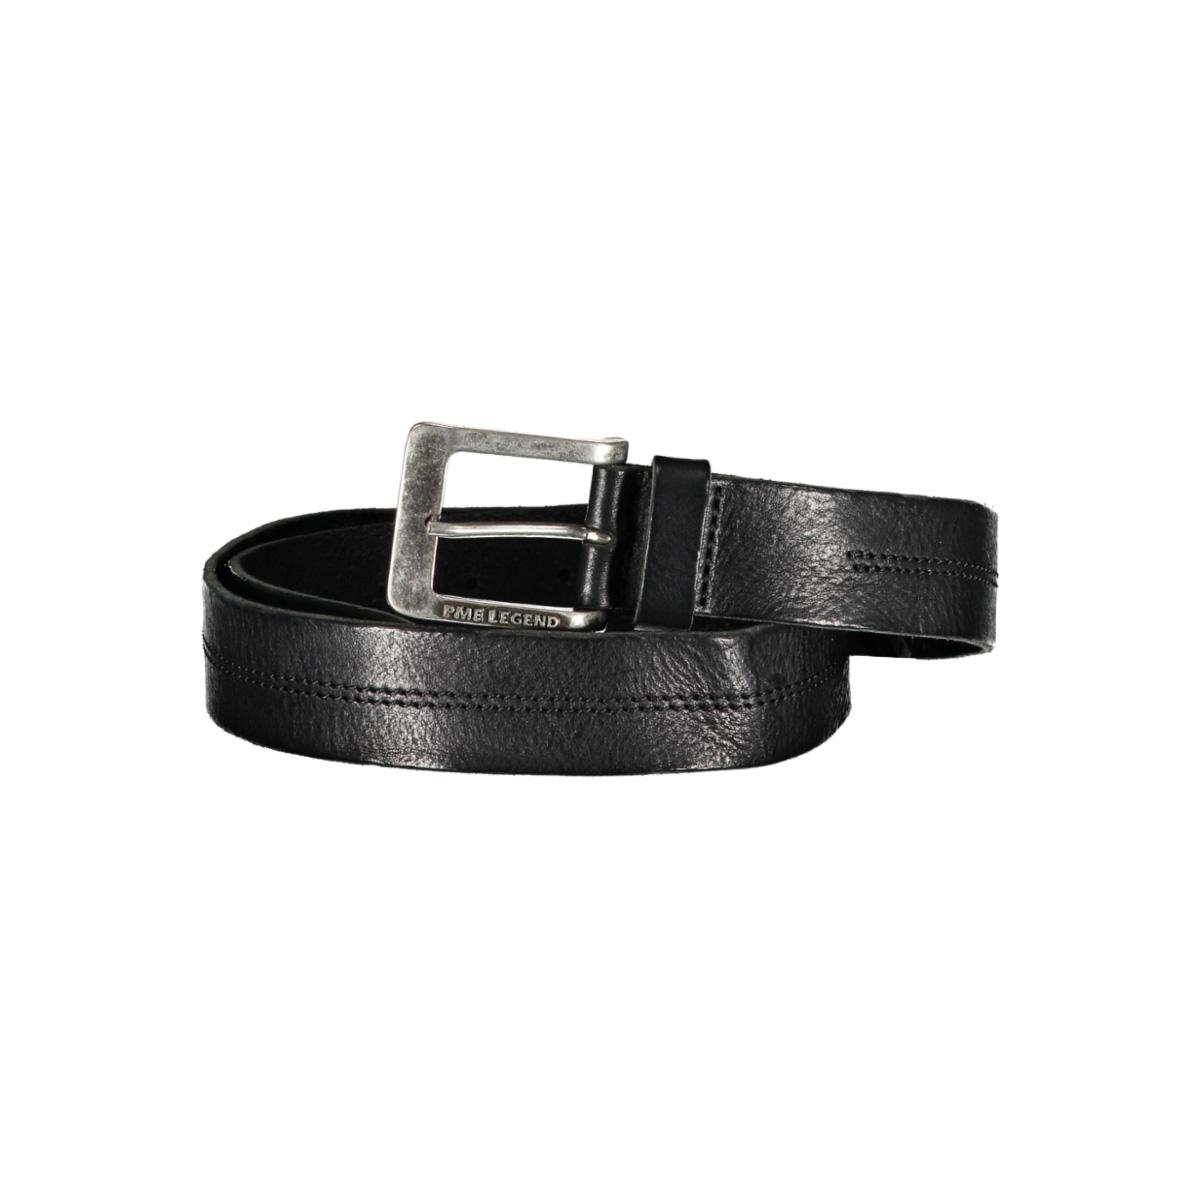 leather belt pbe00112 pme legend riem 999